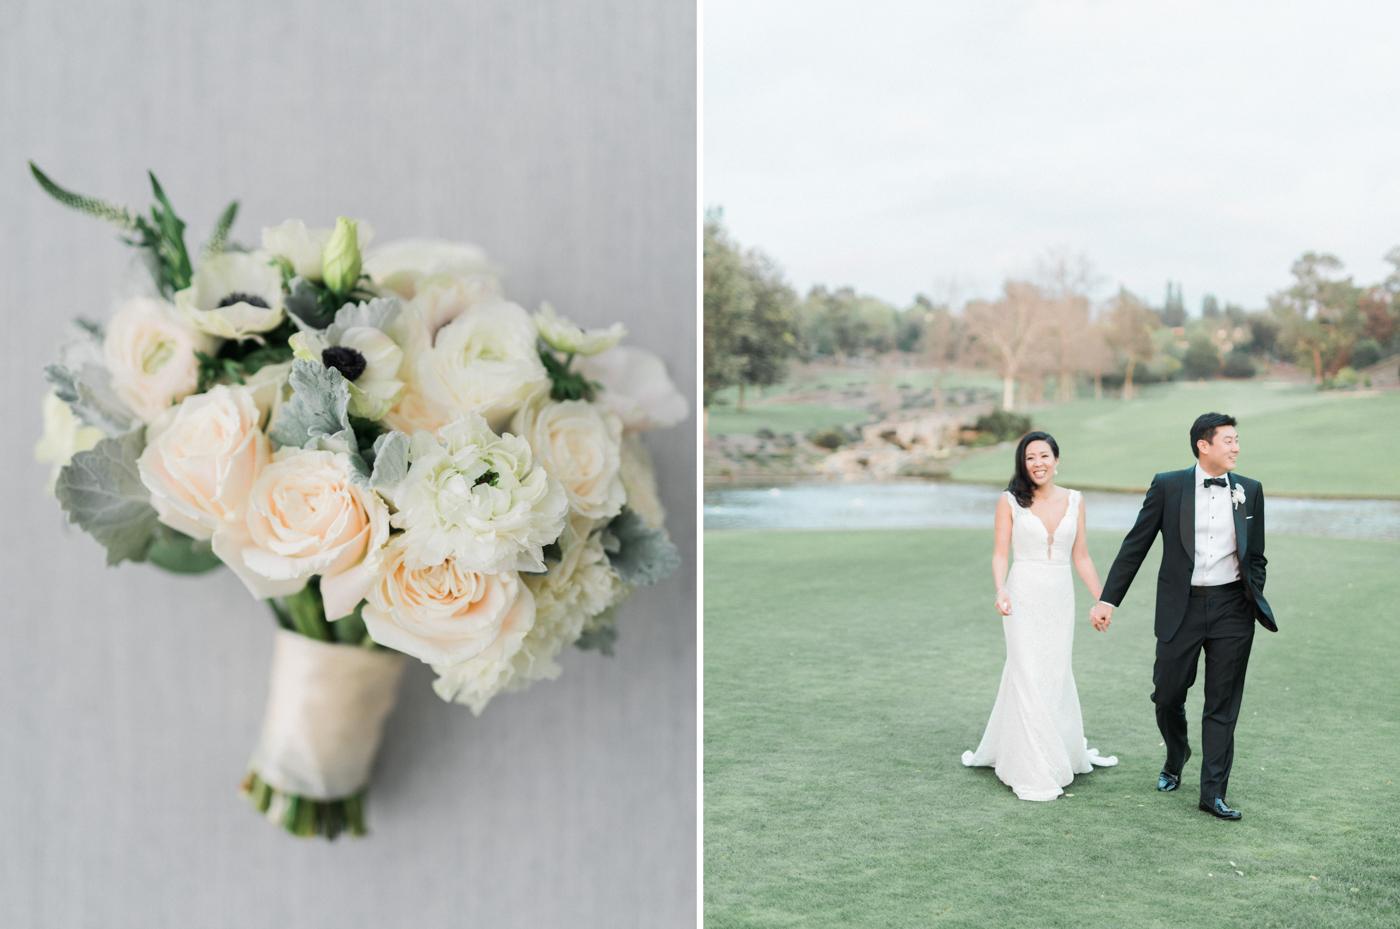 Friendly_Hills_Country_Club_fine_art_wedding_photographer_los_angeles_paris-11.jpg